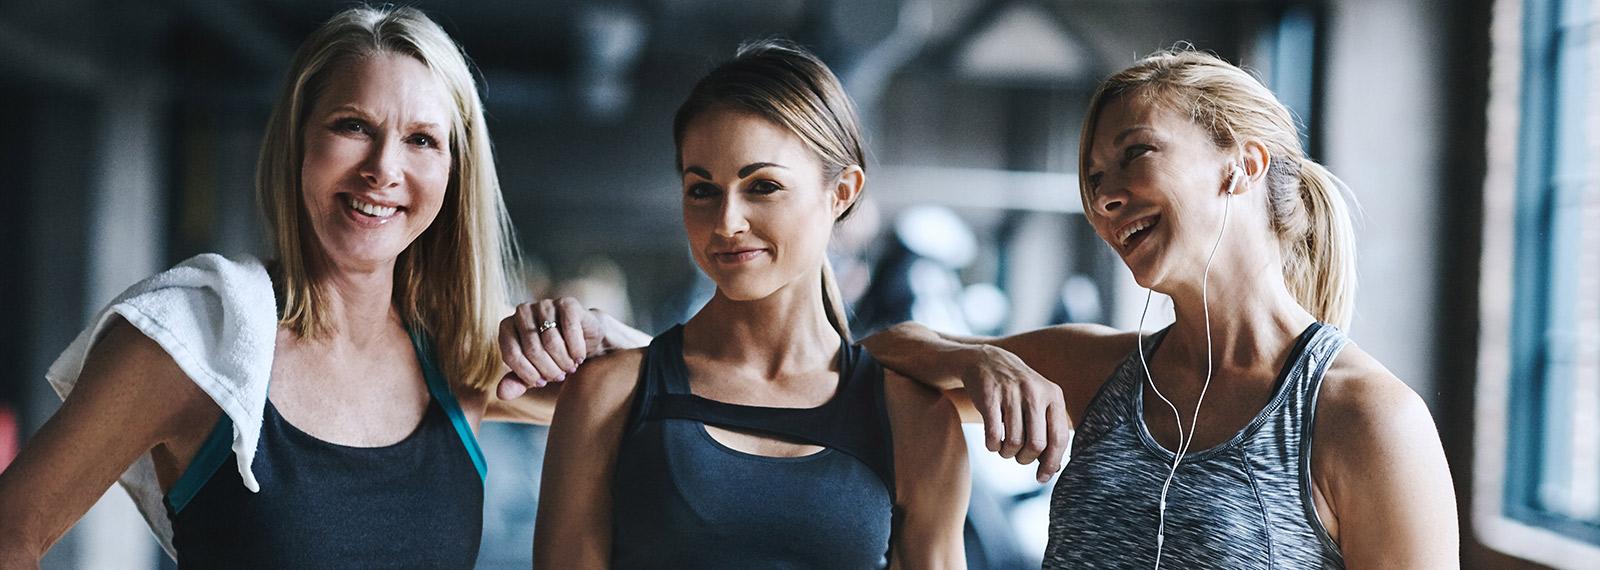 Frauen beim Fitness Training im Fitness-Loft